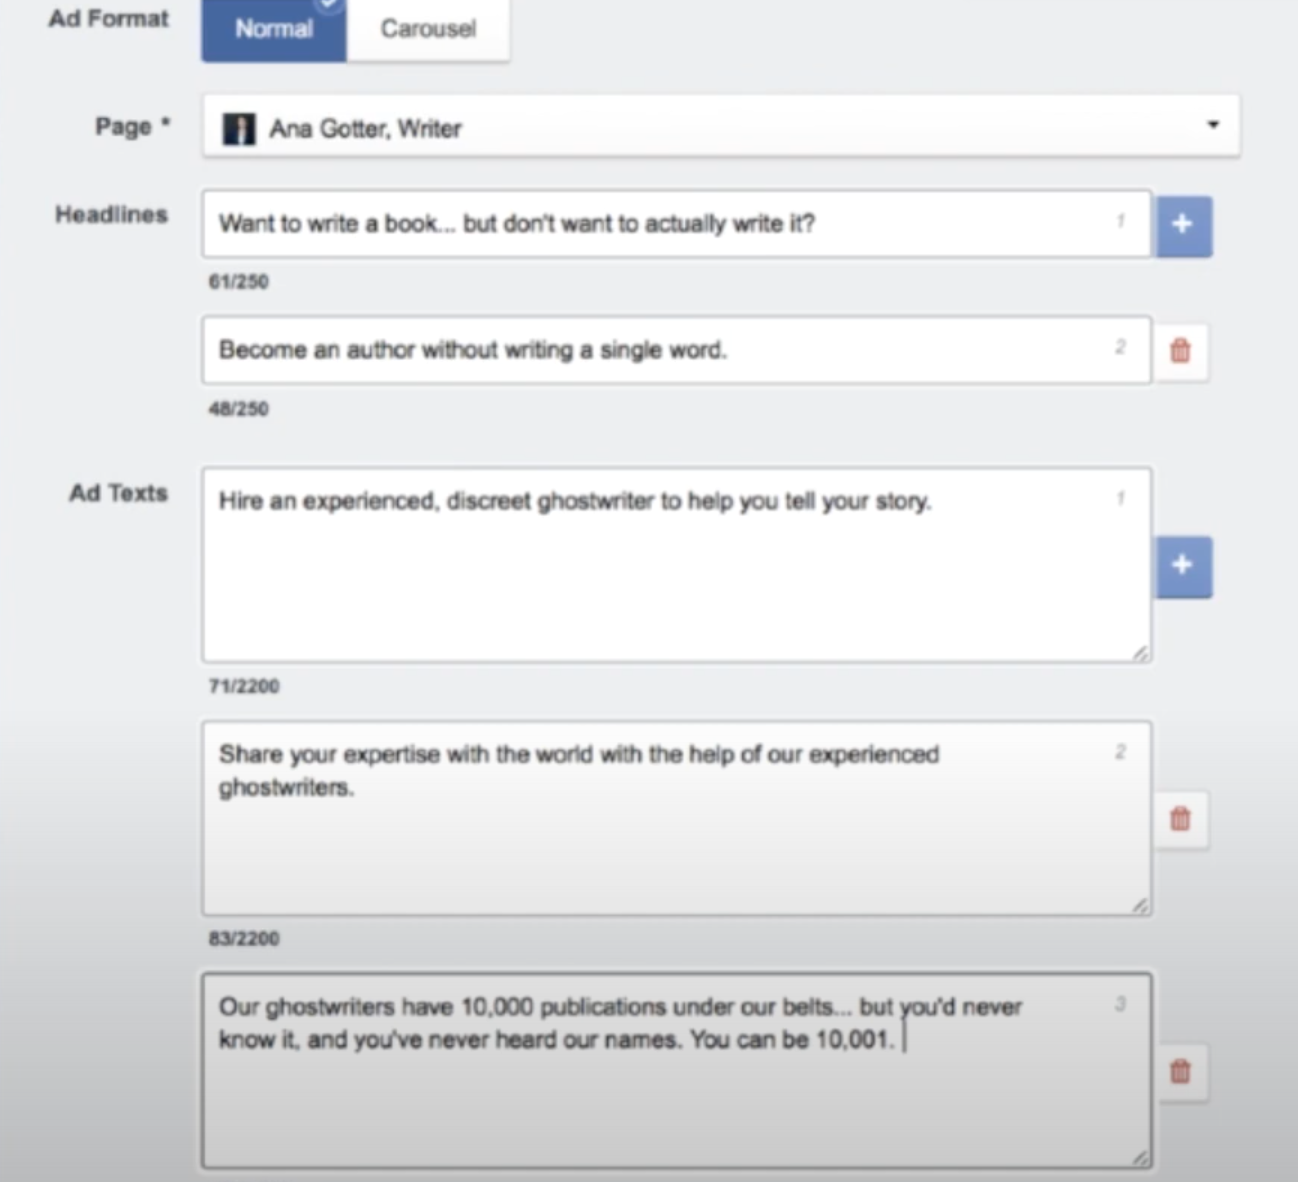 AdEspresso's ad creation tool